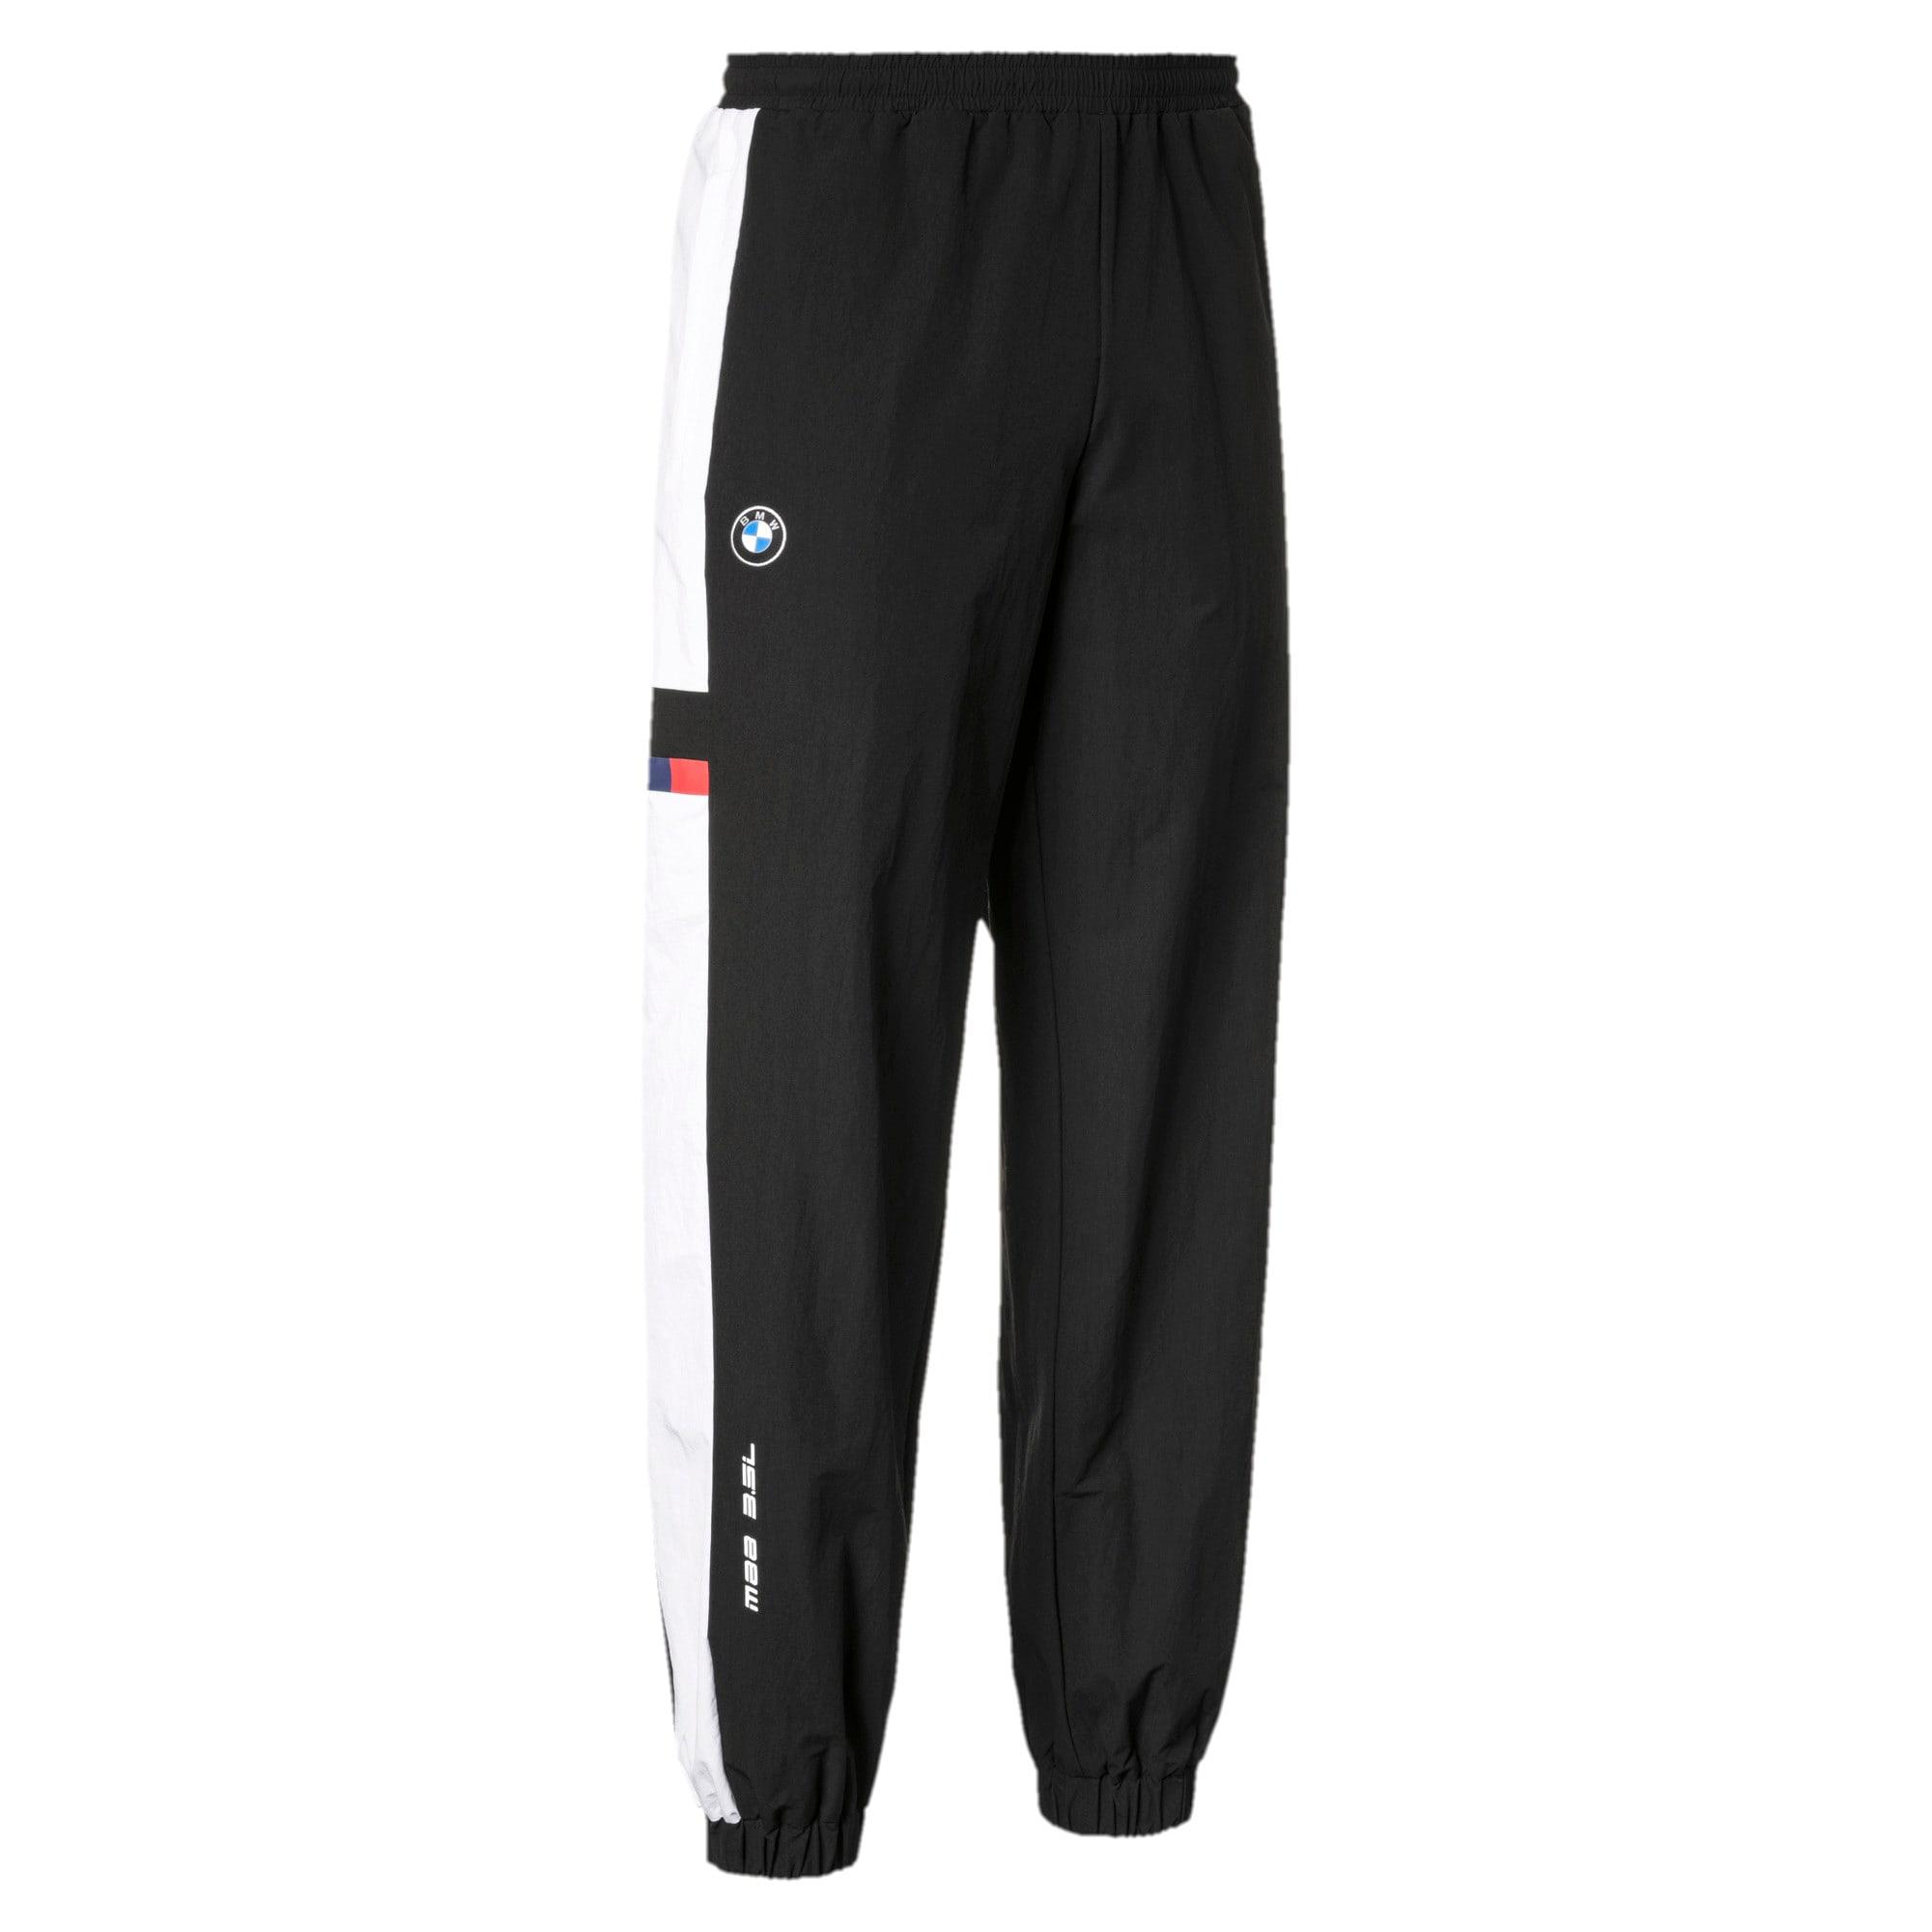 Thumbnail 3 of BMW M Motorsport Street Men's Woven Pants, Puma Black, medium